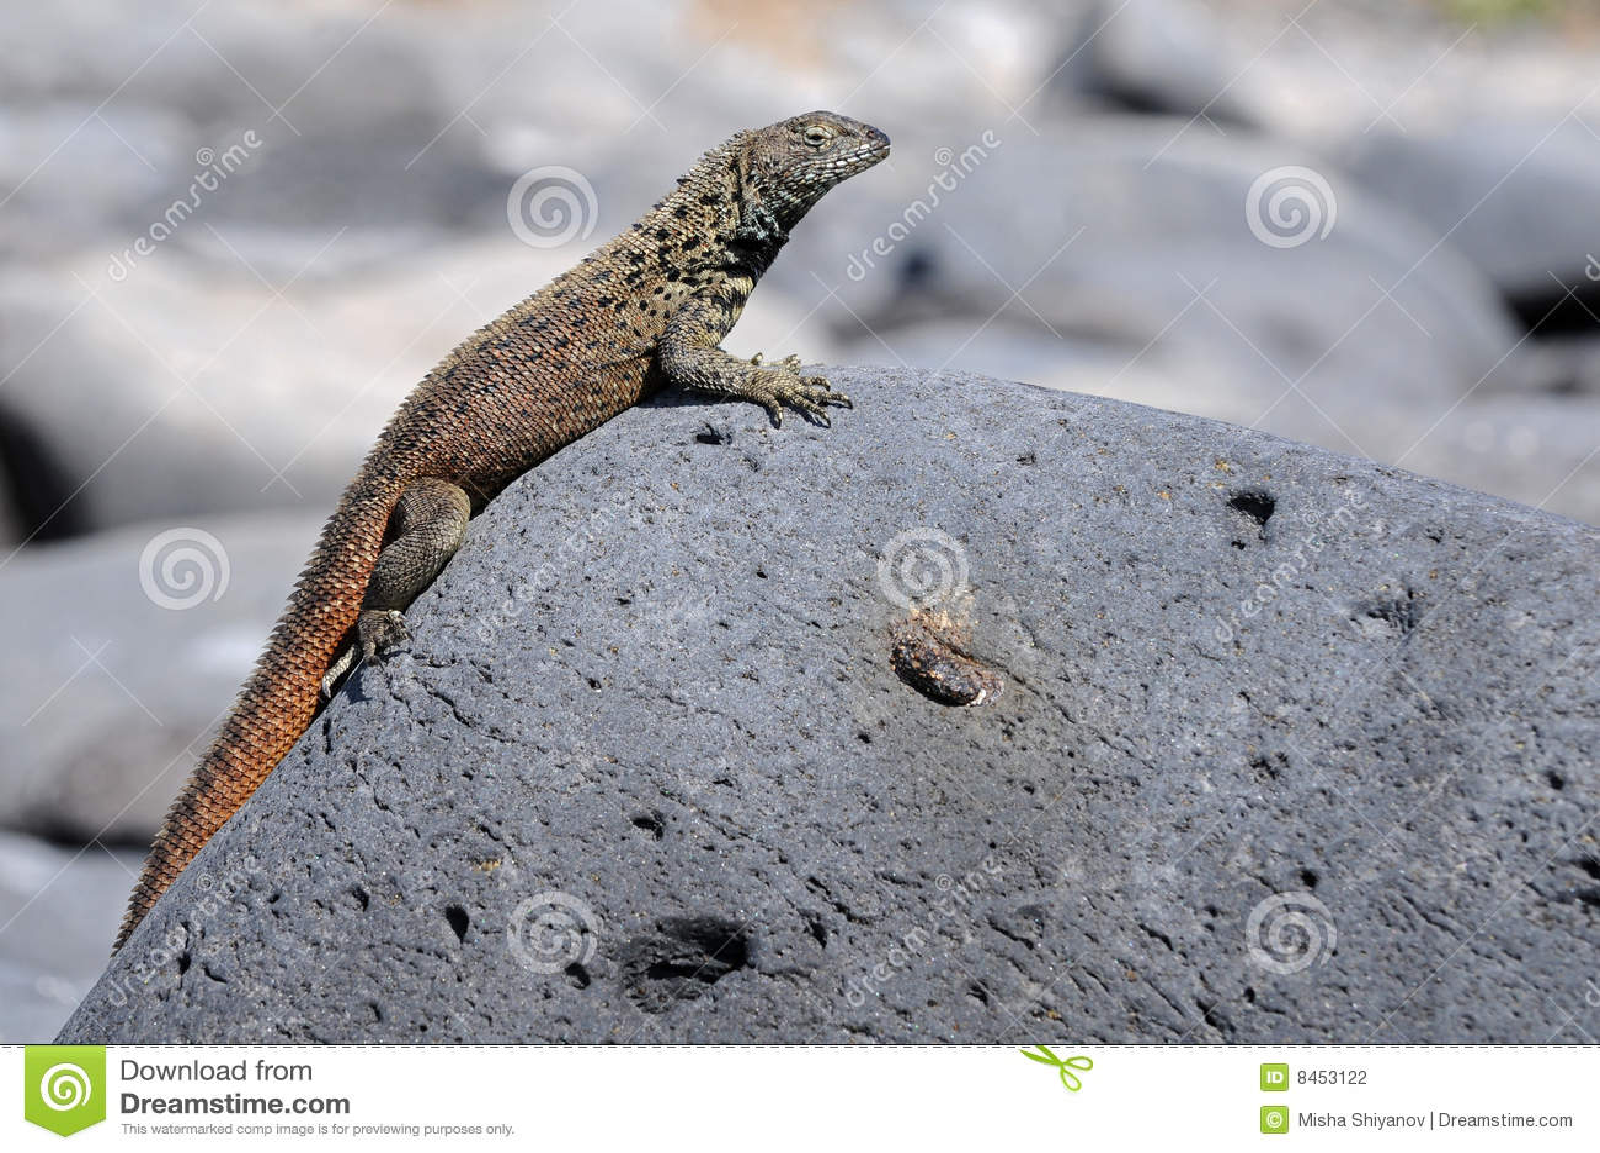 A Small Galapagos Lizard Is Taking The Sun Bath Stock